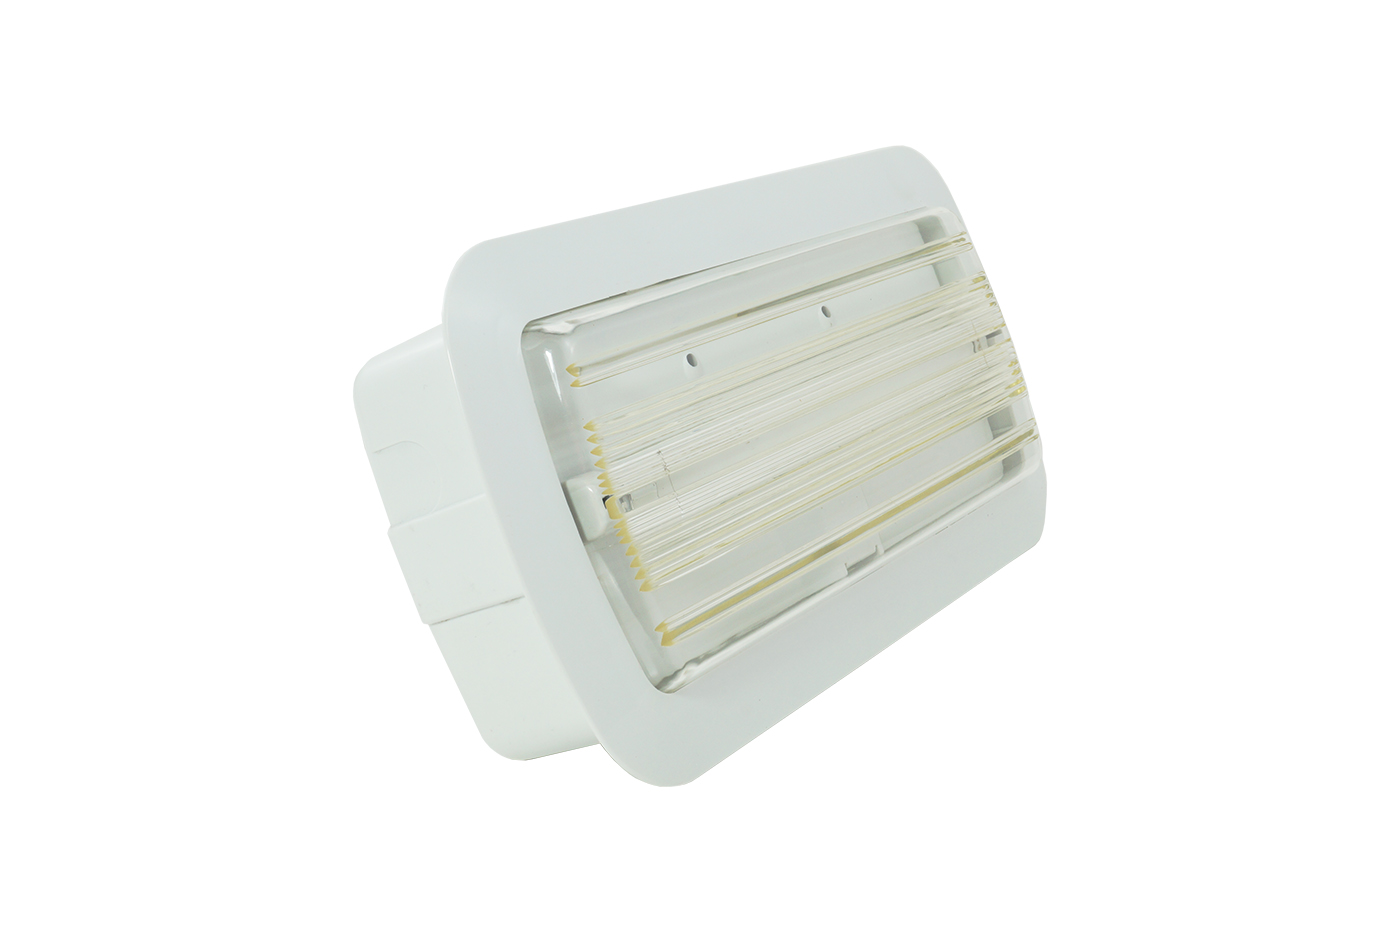 Plafoniere Led Da Incasso : Bes lampade emergenza beselettronica lampada